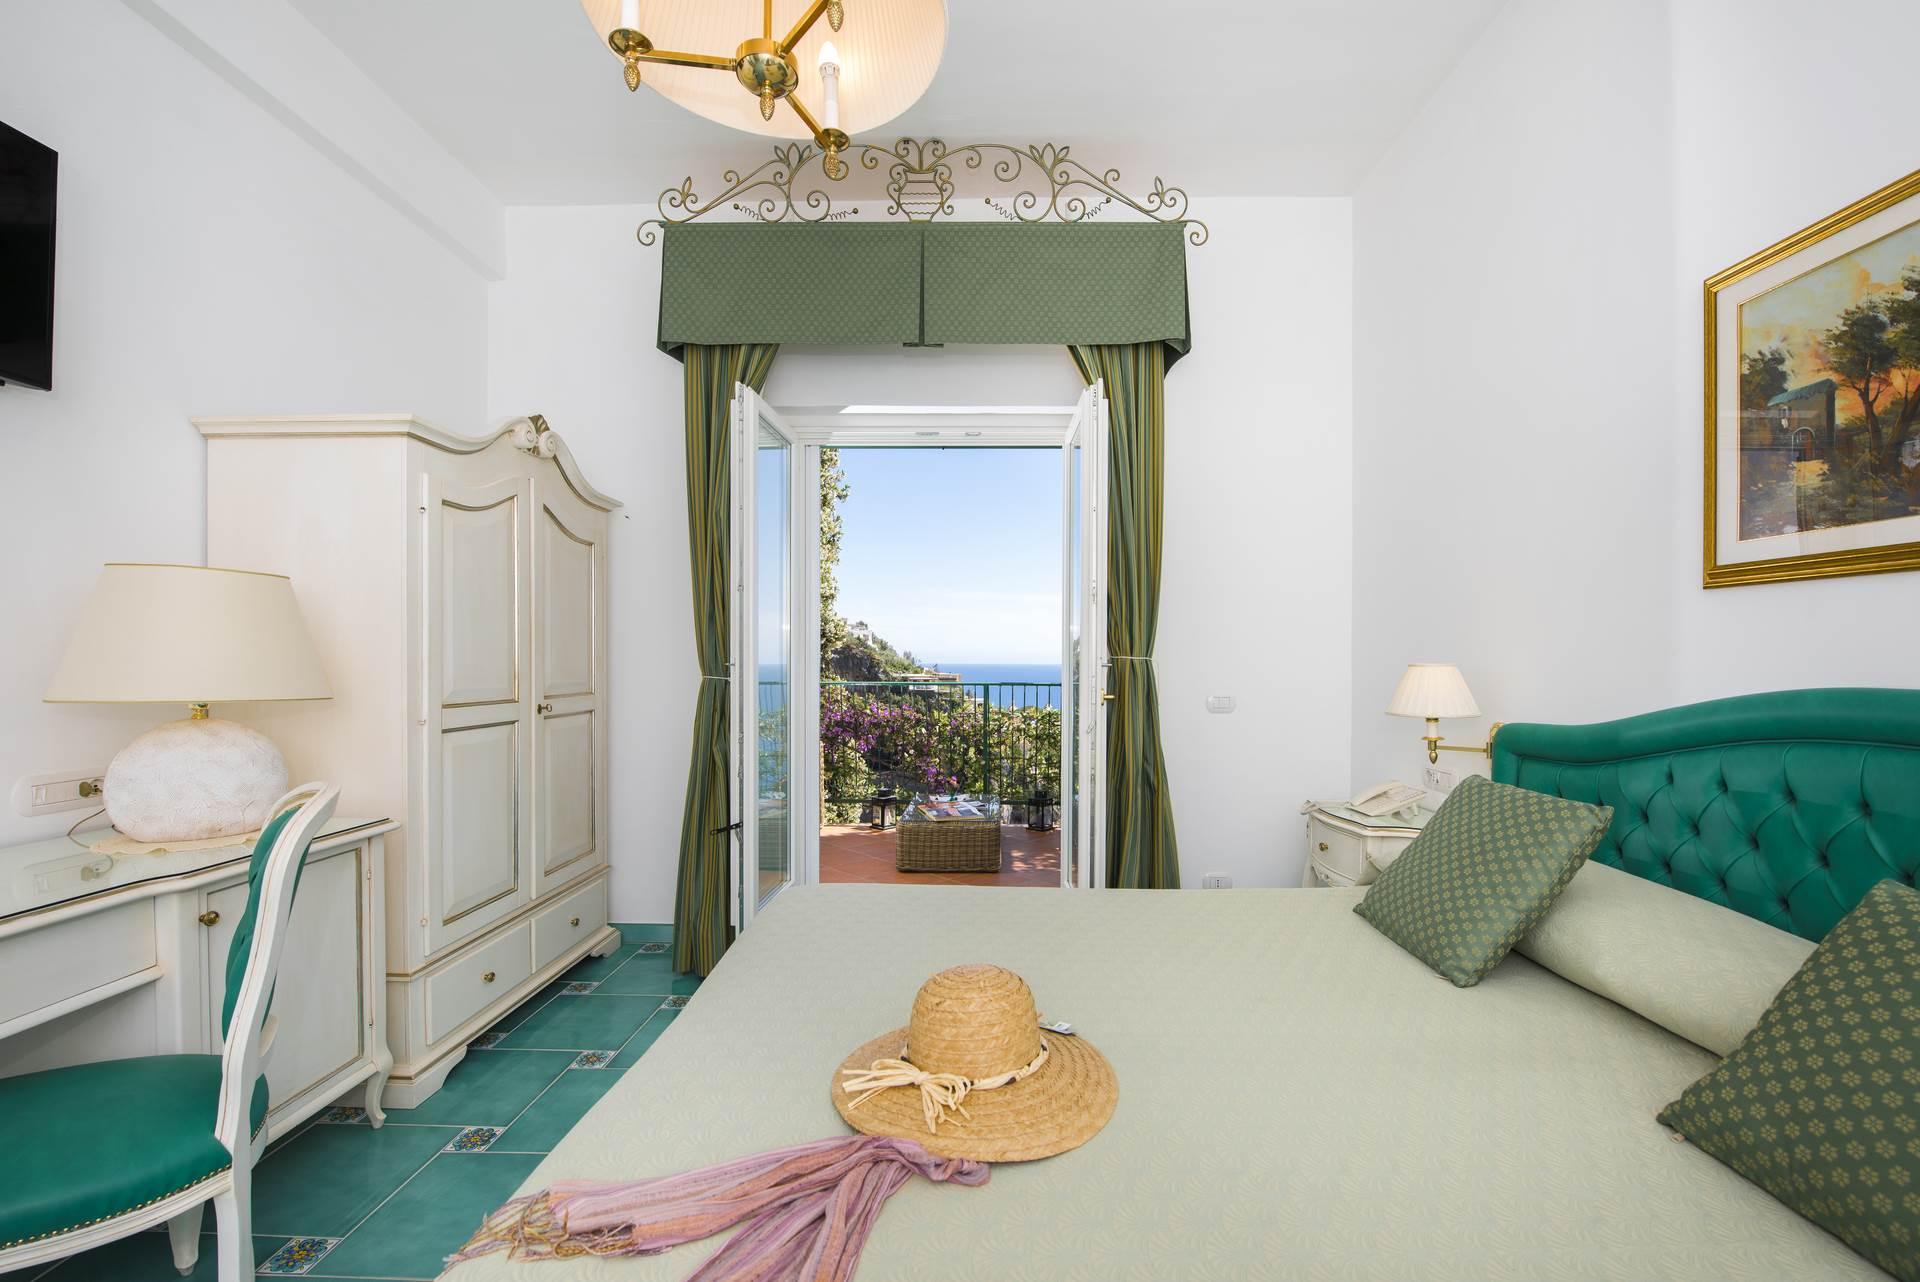 hotel_pellegrino_praiano_44_1920